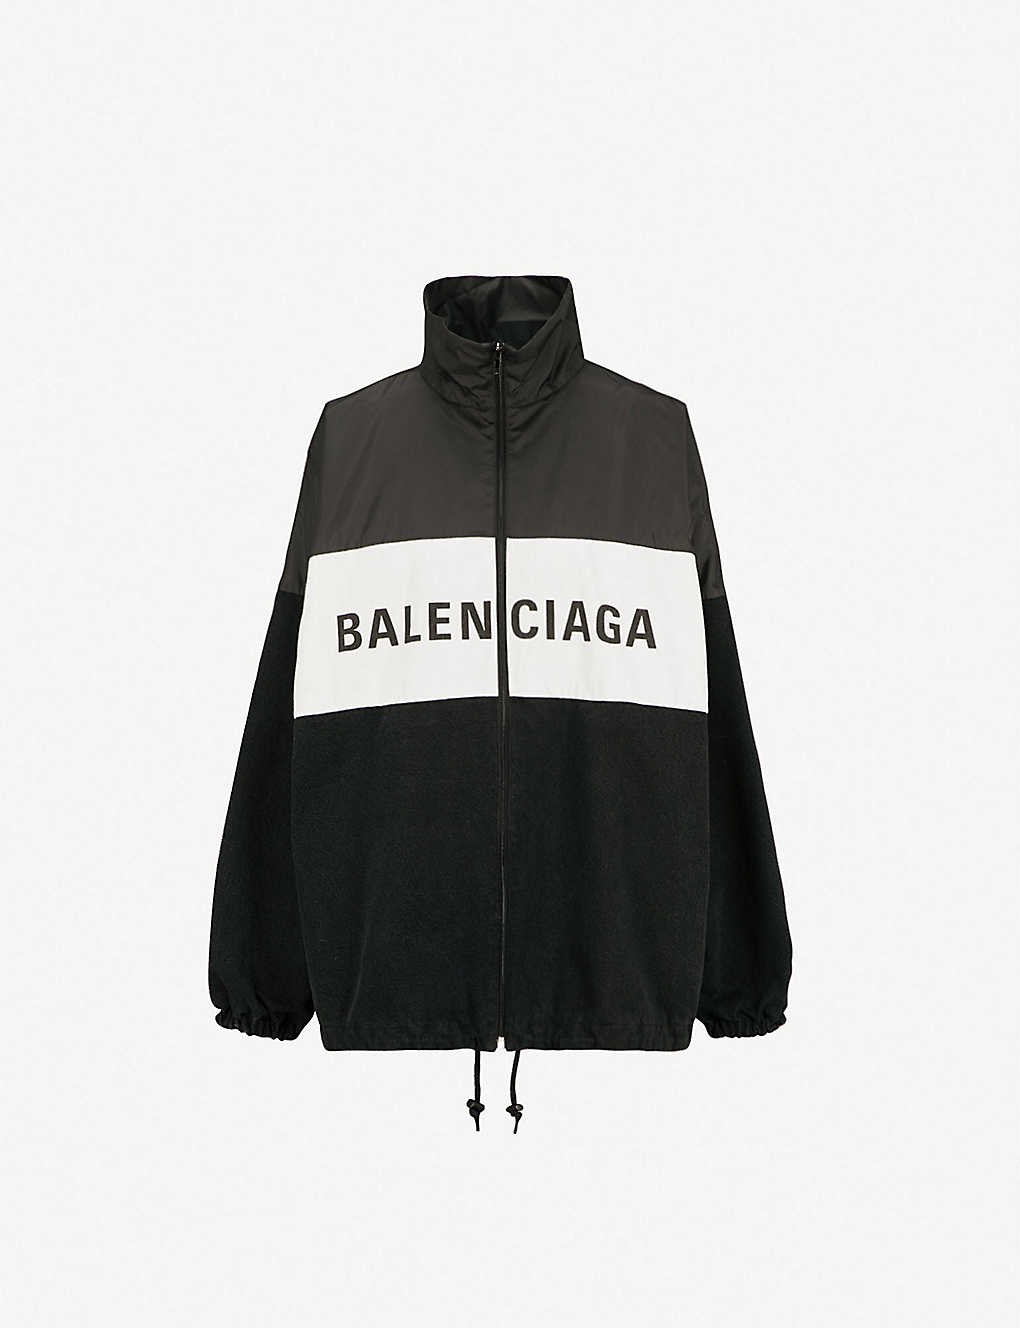 67601f9f7db2 BALENCIAGA - Logo-print nylon and denim jacket | Selfridges.com